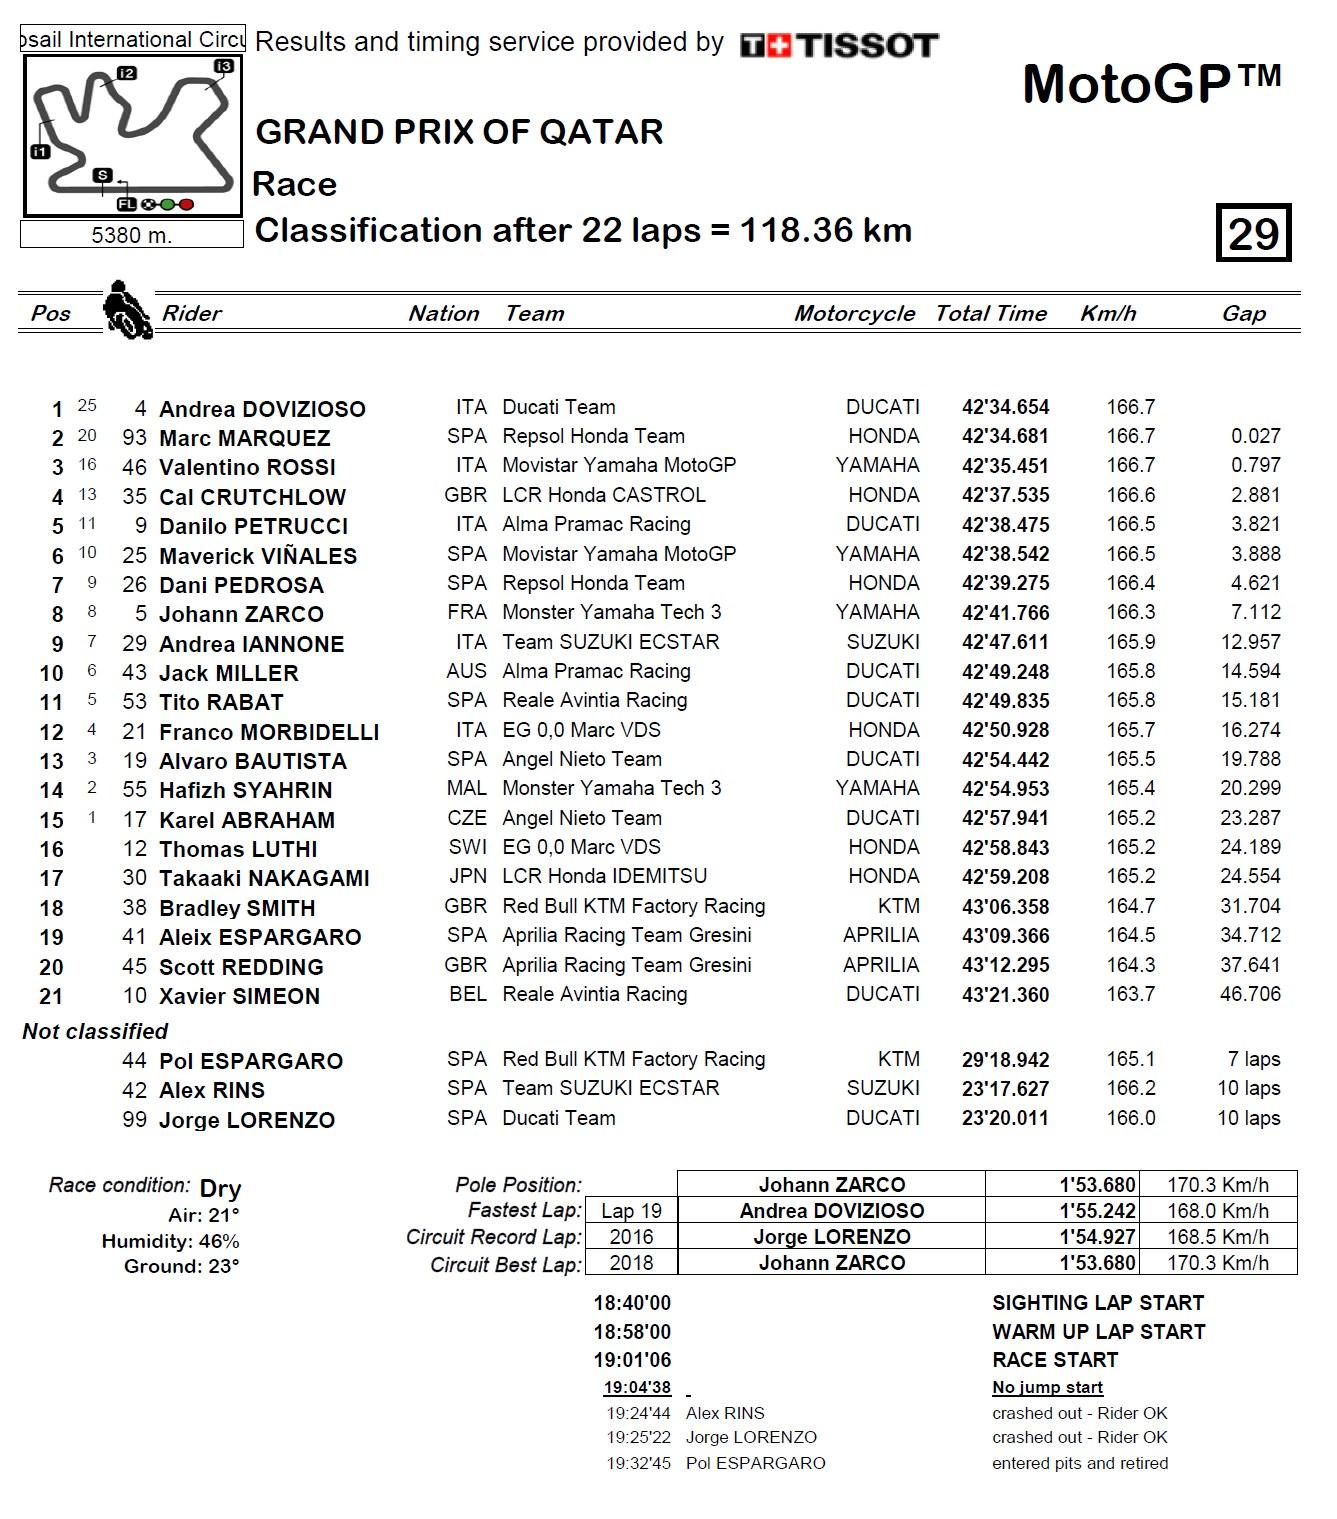 Wyniki GP Kataru 2018 MotoGP